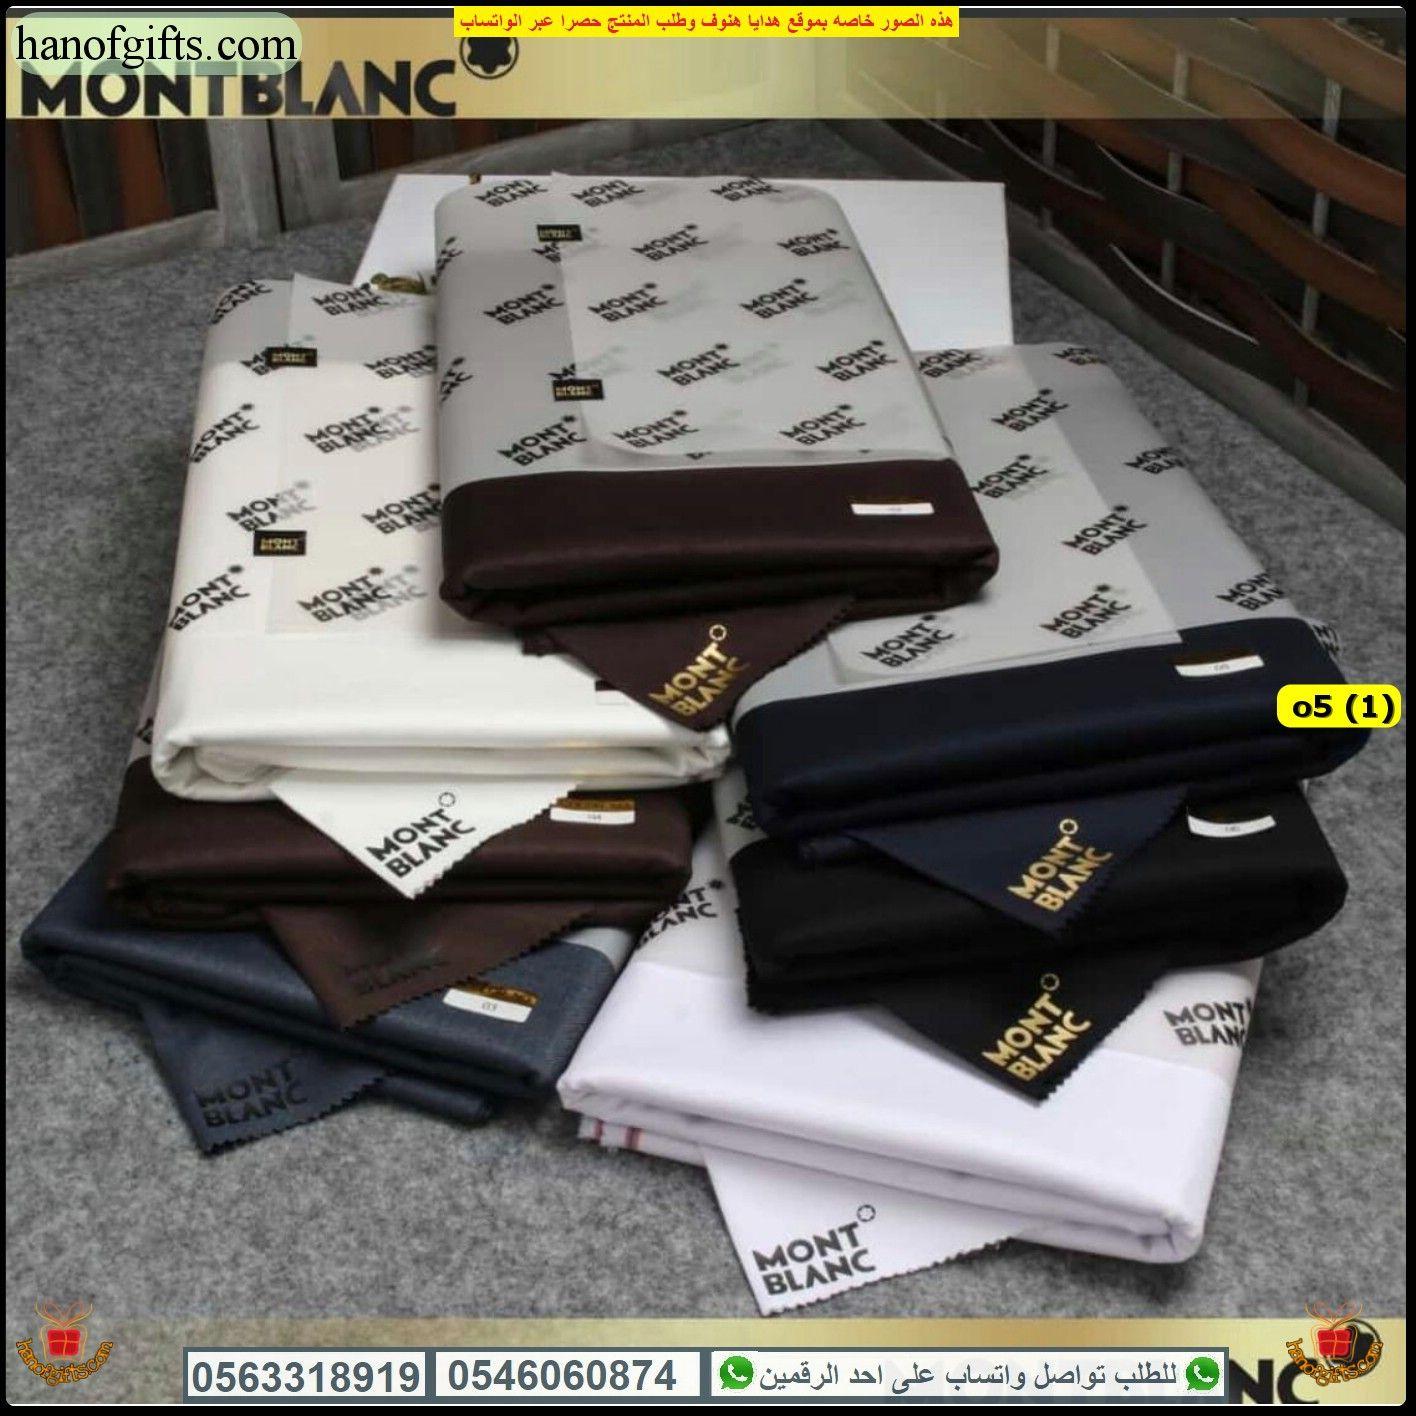 قماش مونت بلانك شتوي او صيفي مع ملحقات الماركه وشماغ مونت بلانك هدايا هنوف Louis Vuitton Twist Bag Louis Vuitton Twist Shoulder Bag